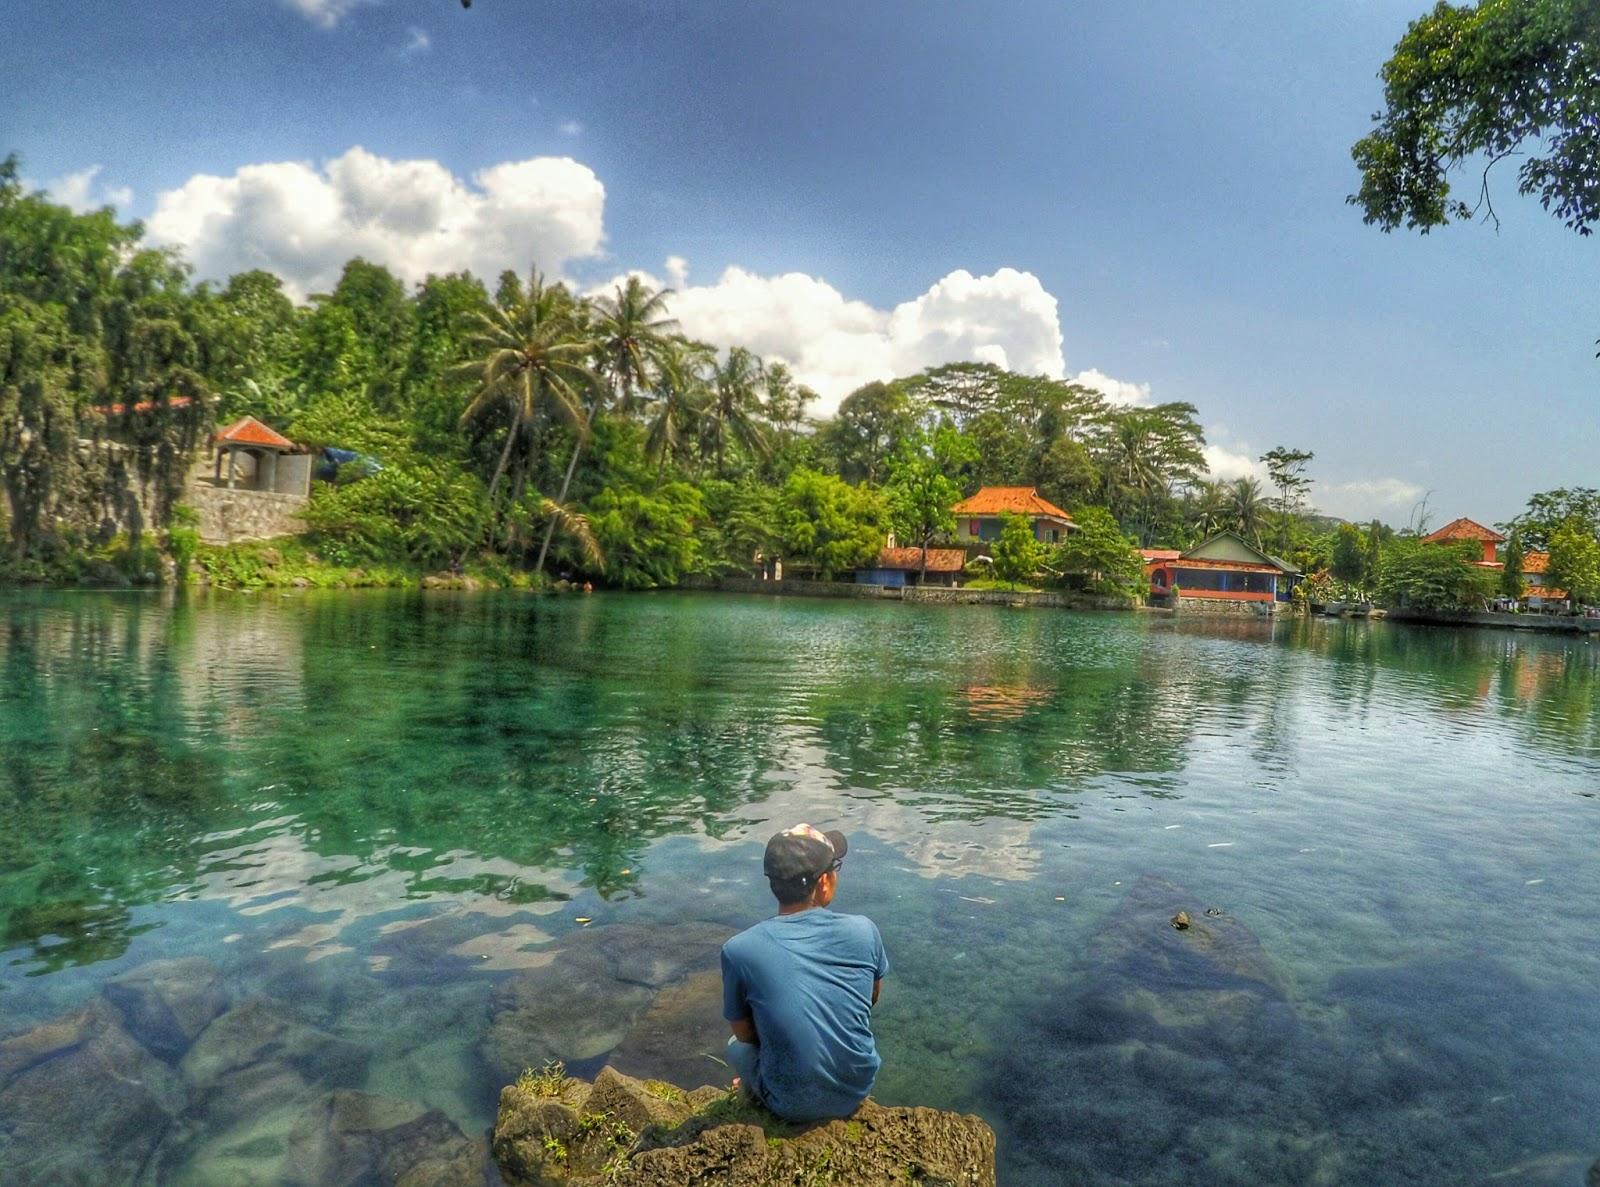 Wisata Alam Danau Herang Majalengka, Seru Abis  Majalengka Update